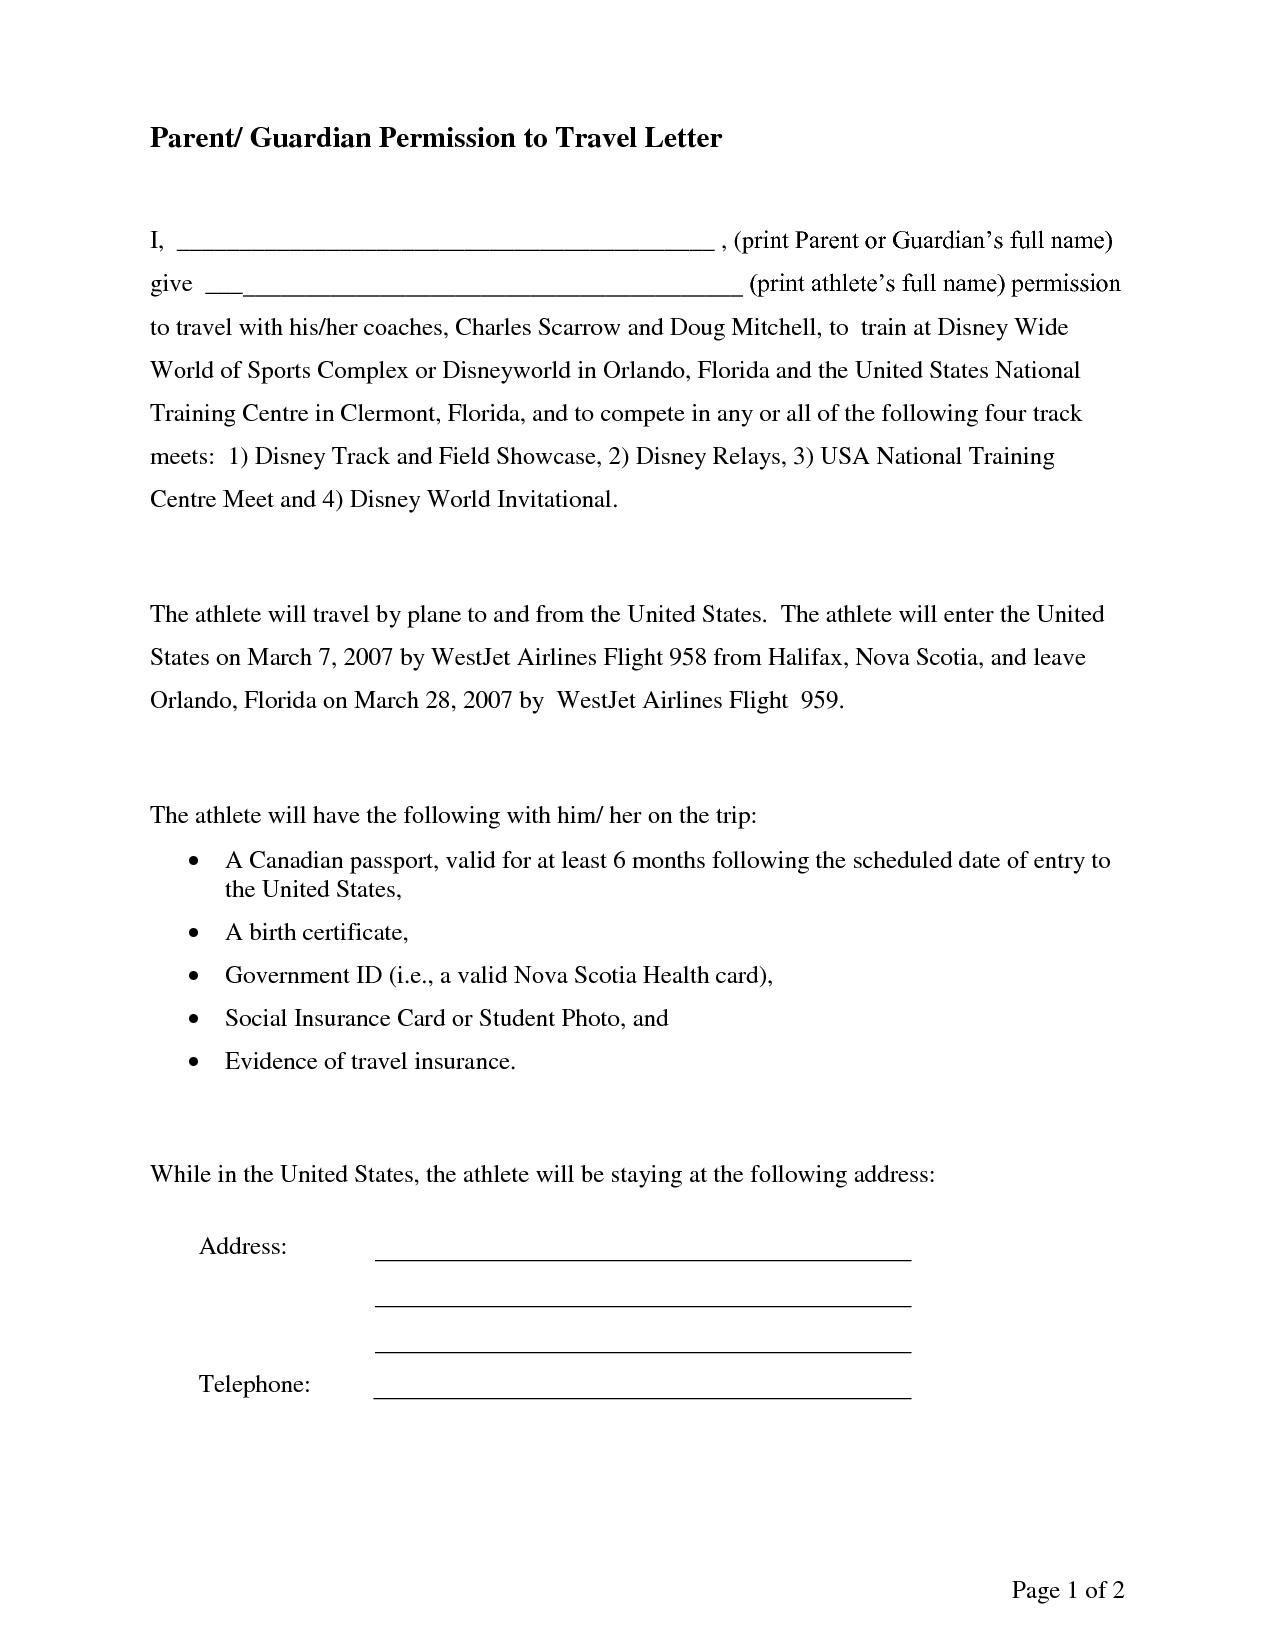 Permission to Travel Letter Template - Parental Consent Permission Letter Sample